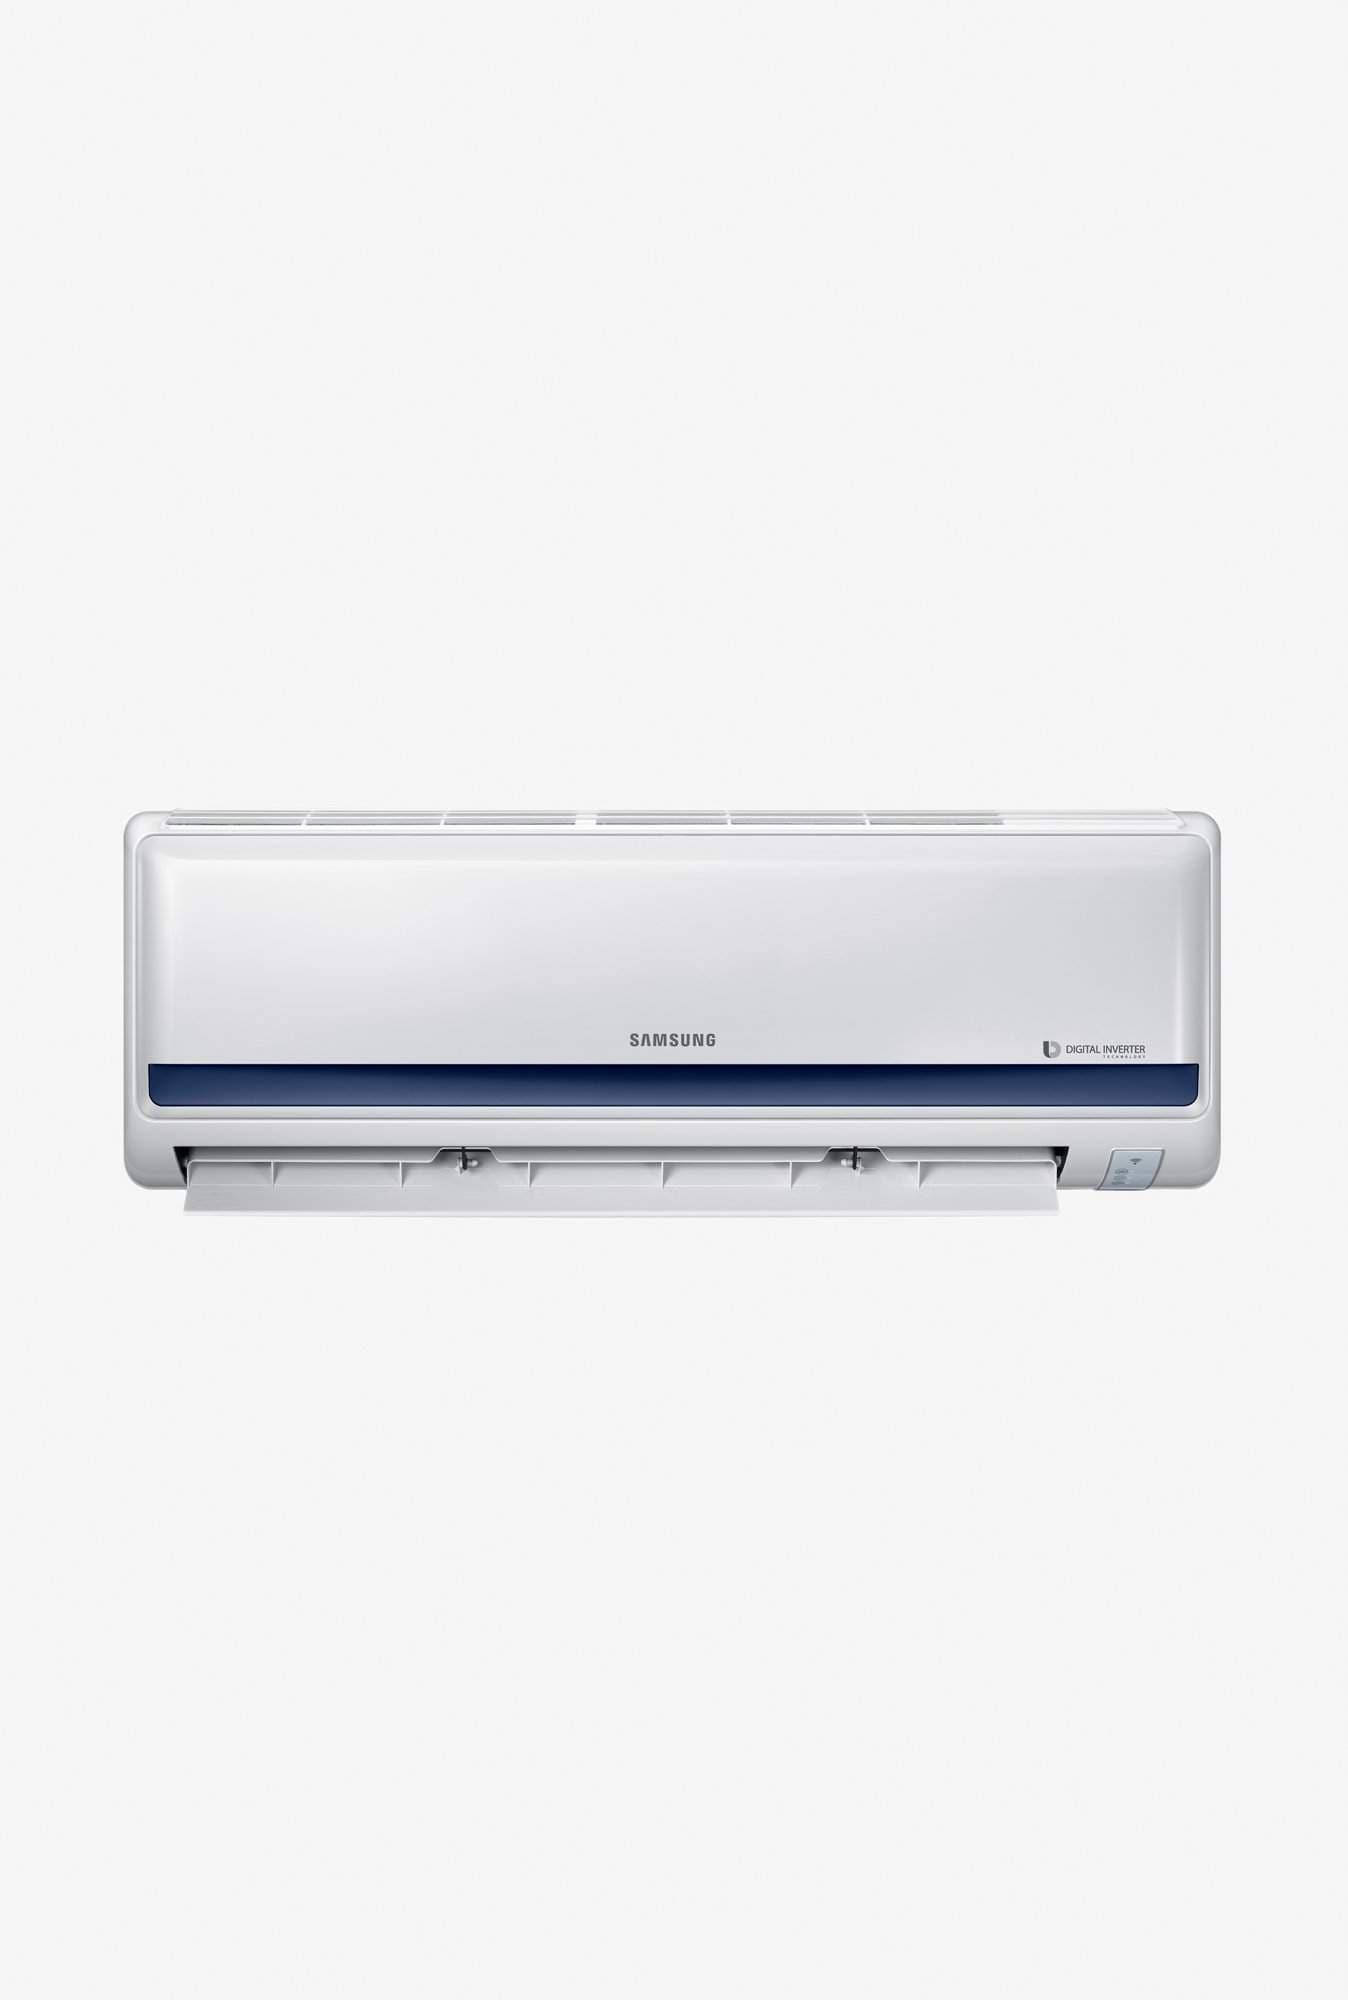 Samsung 1.5 Ton 3 Star (BEE Rating 2017) AR18MV3UFMCNNA Split AC (White)